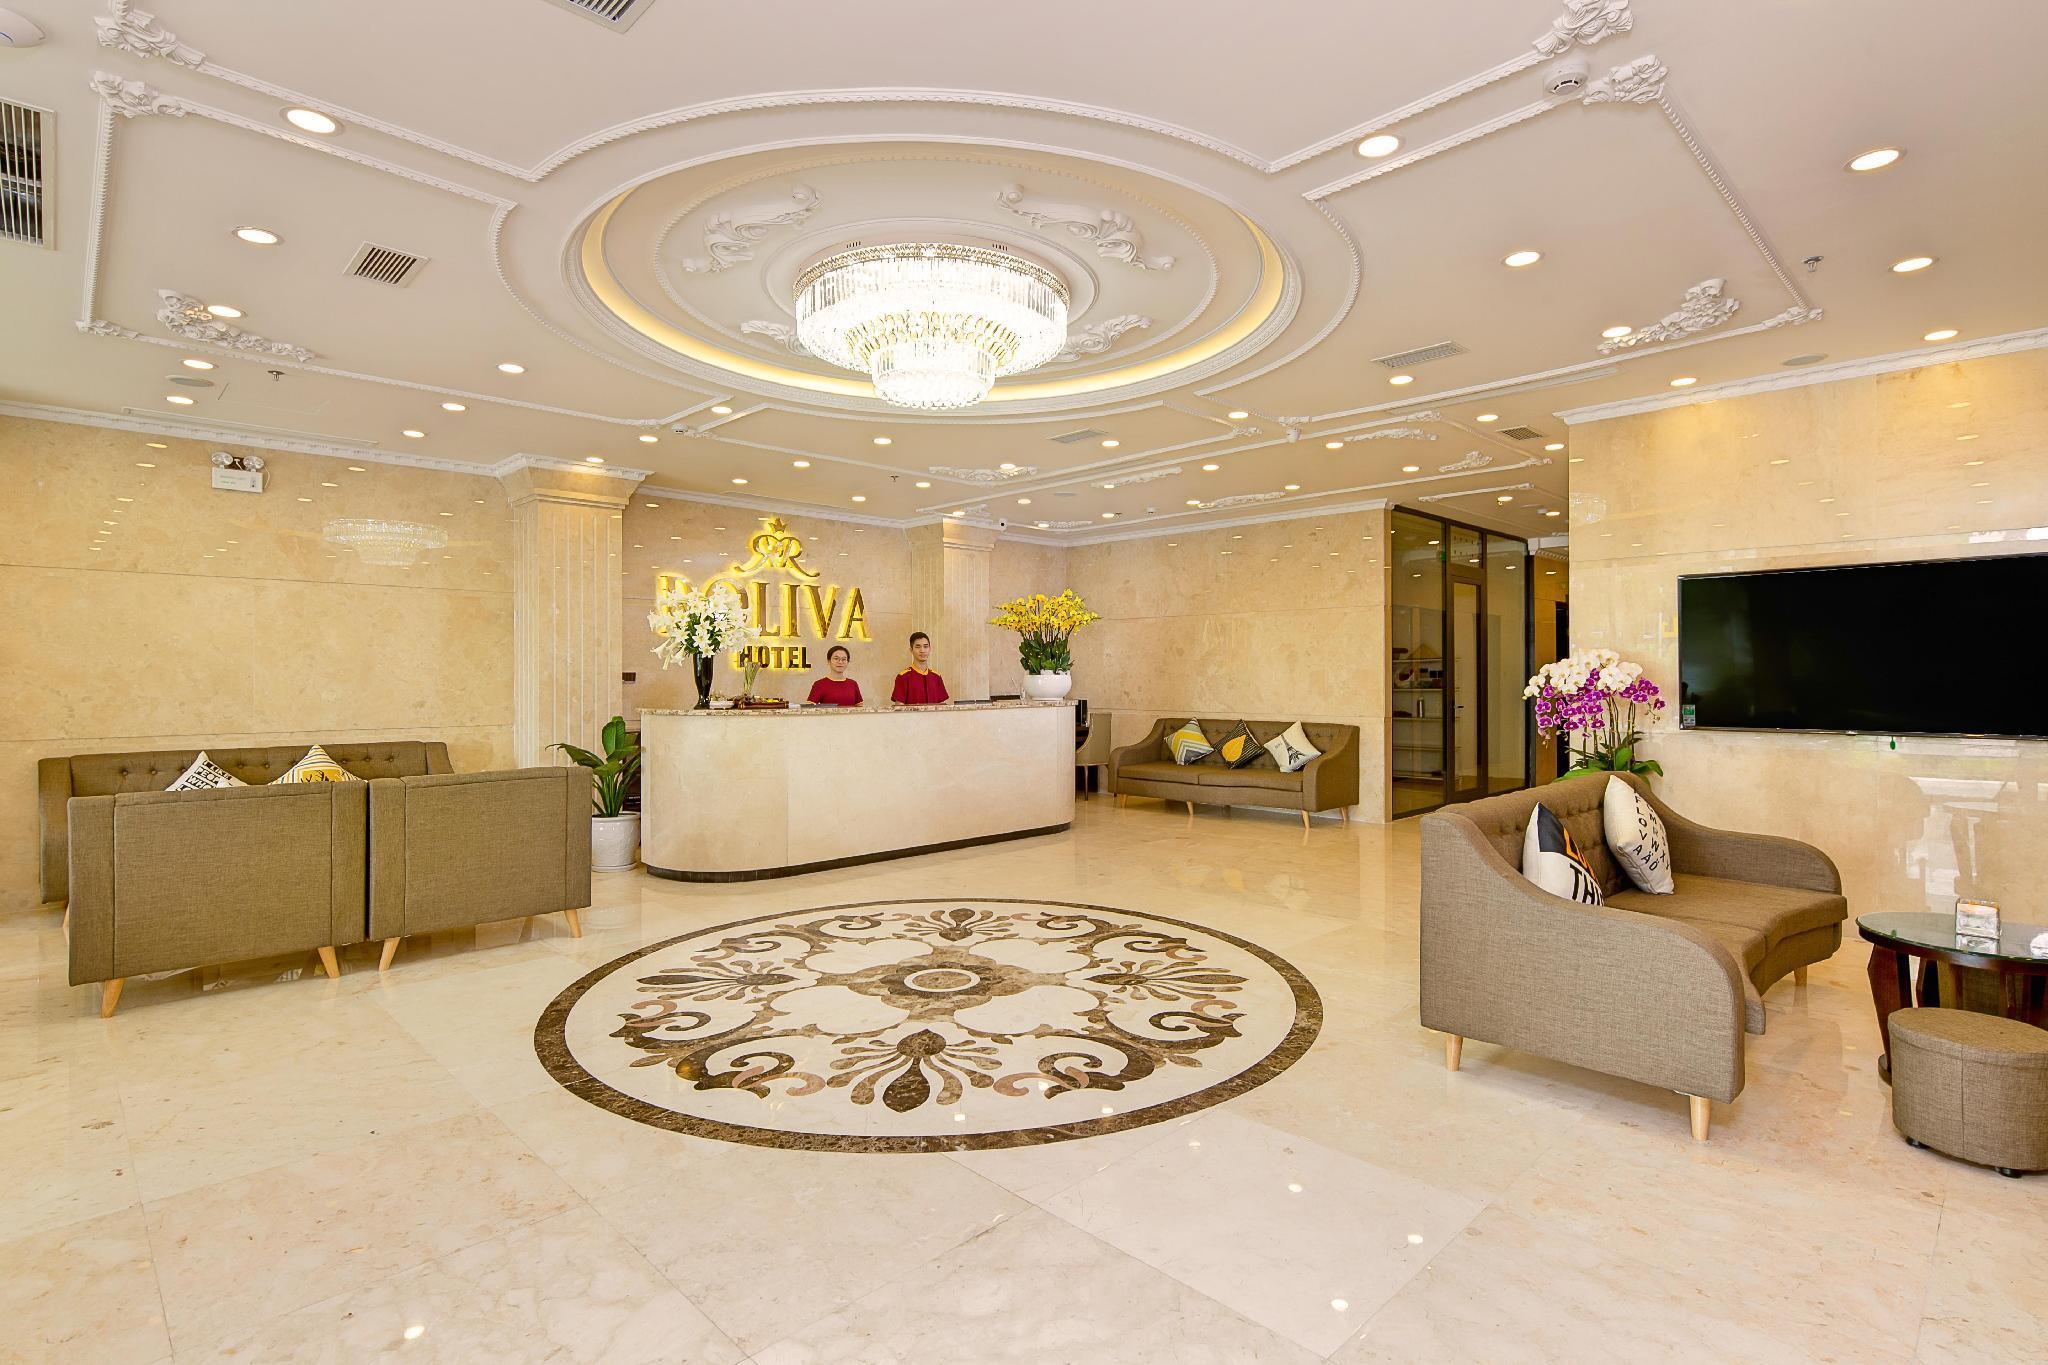 Roliva Hotel And Apartment Danang